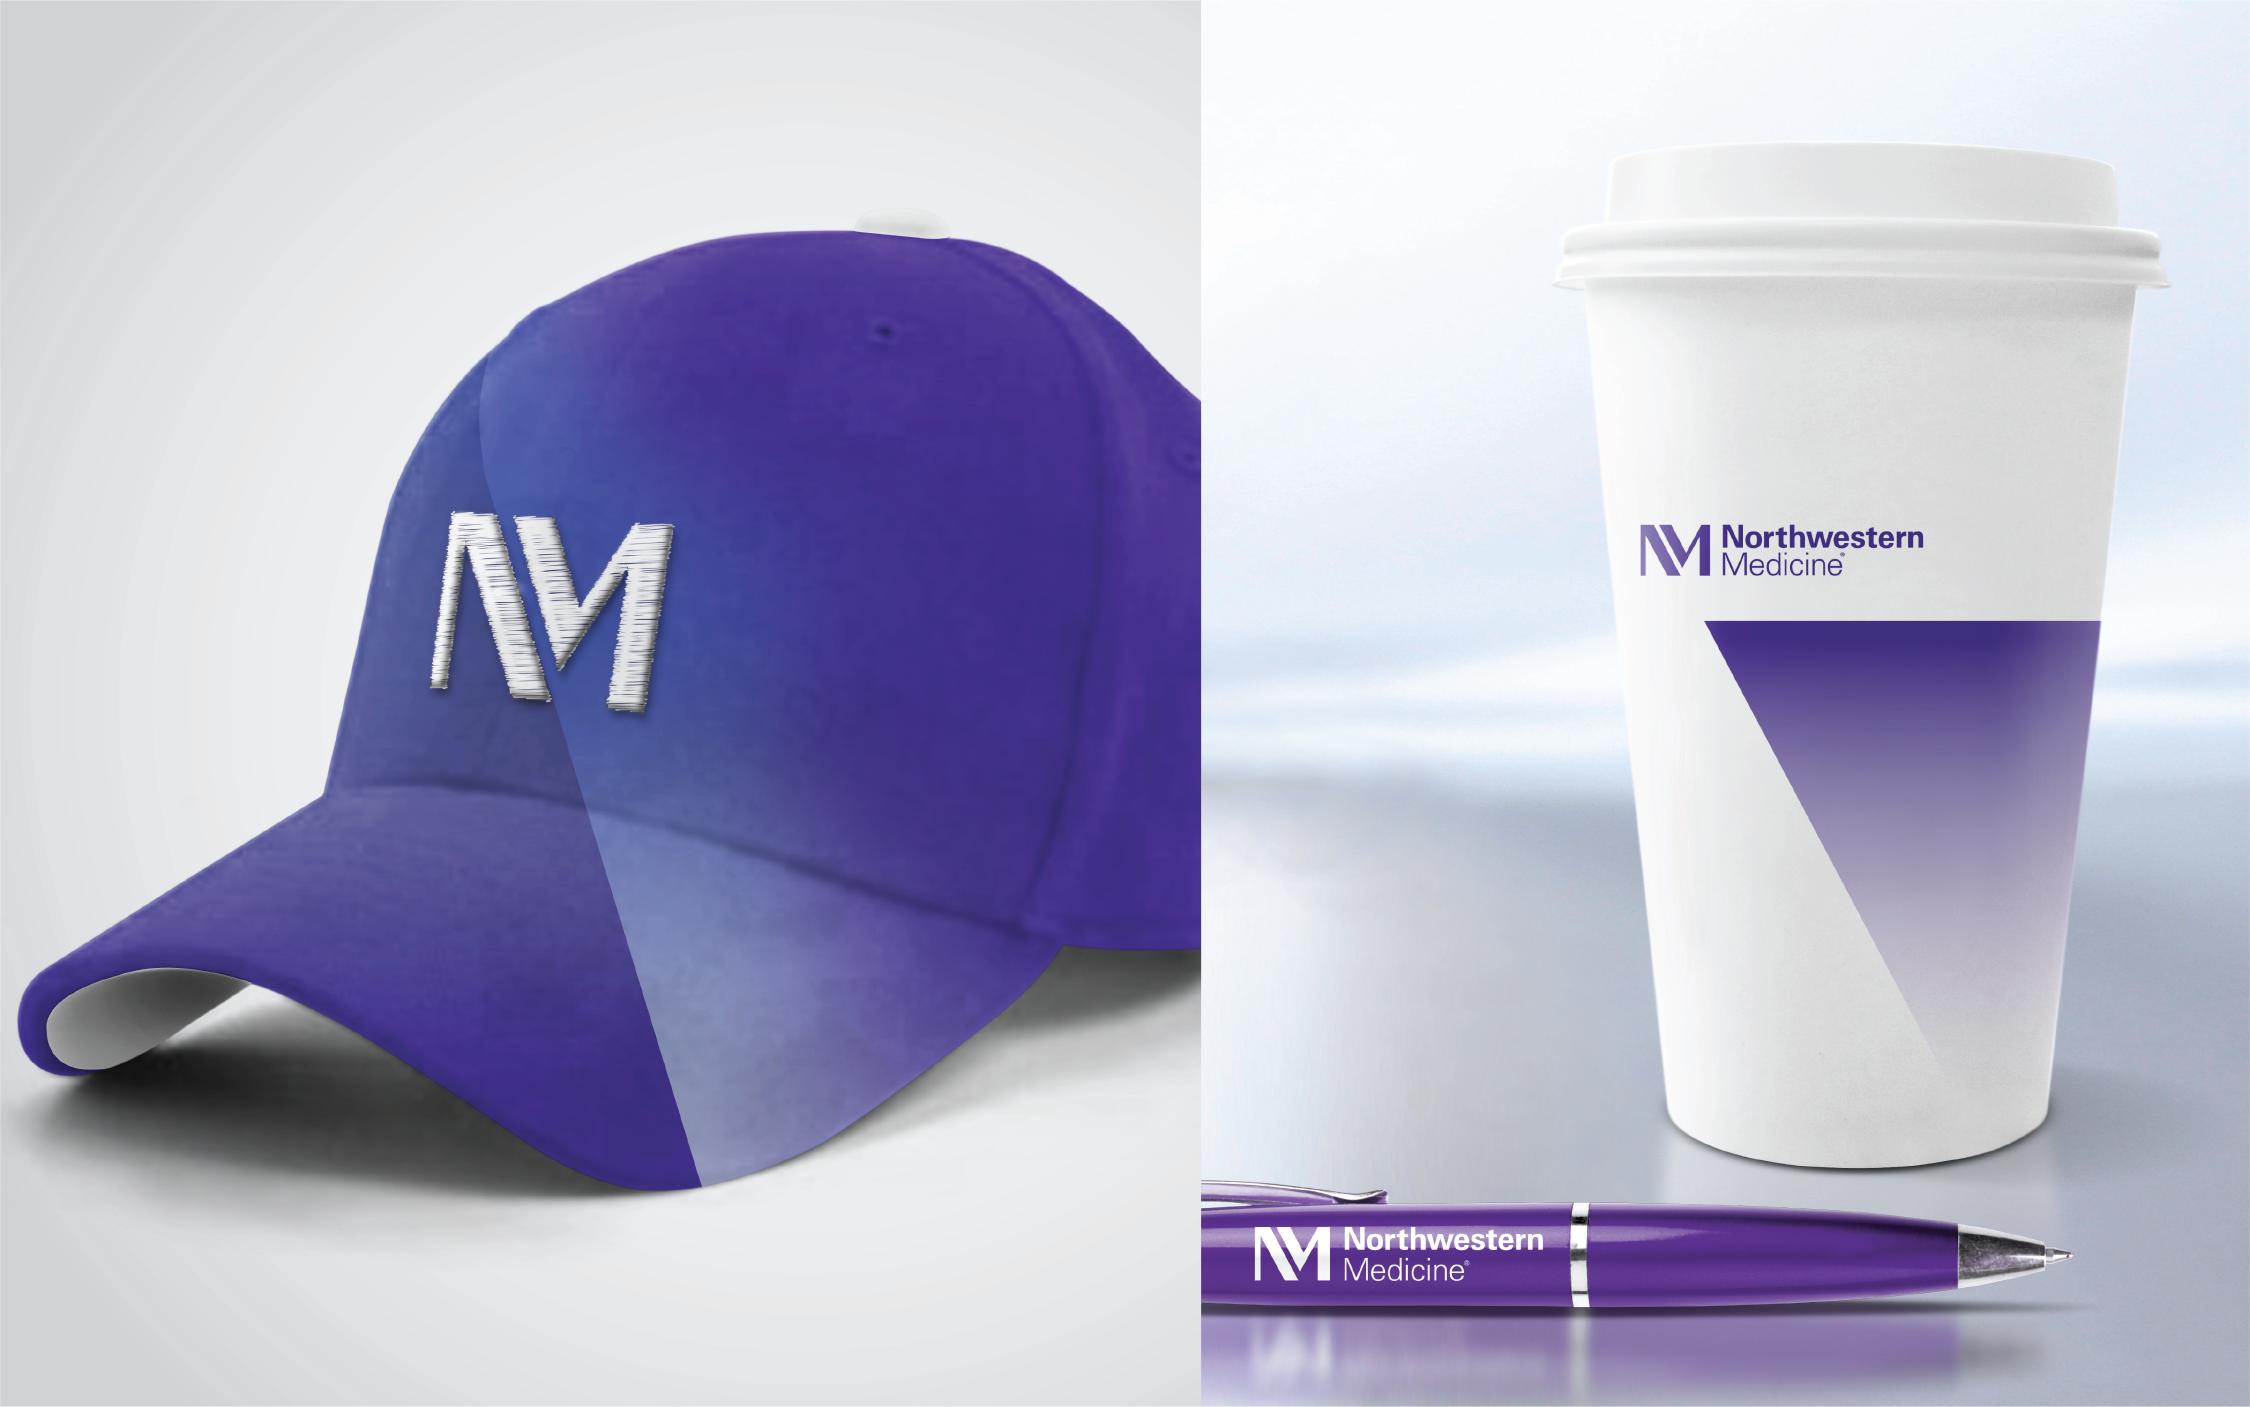 NorthwesternMedicine_website_new-10.png